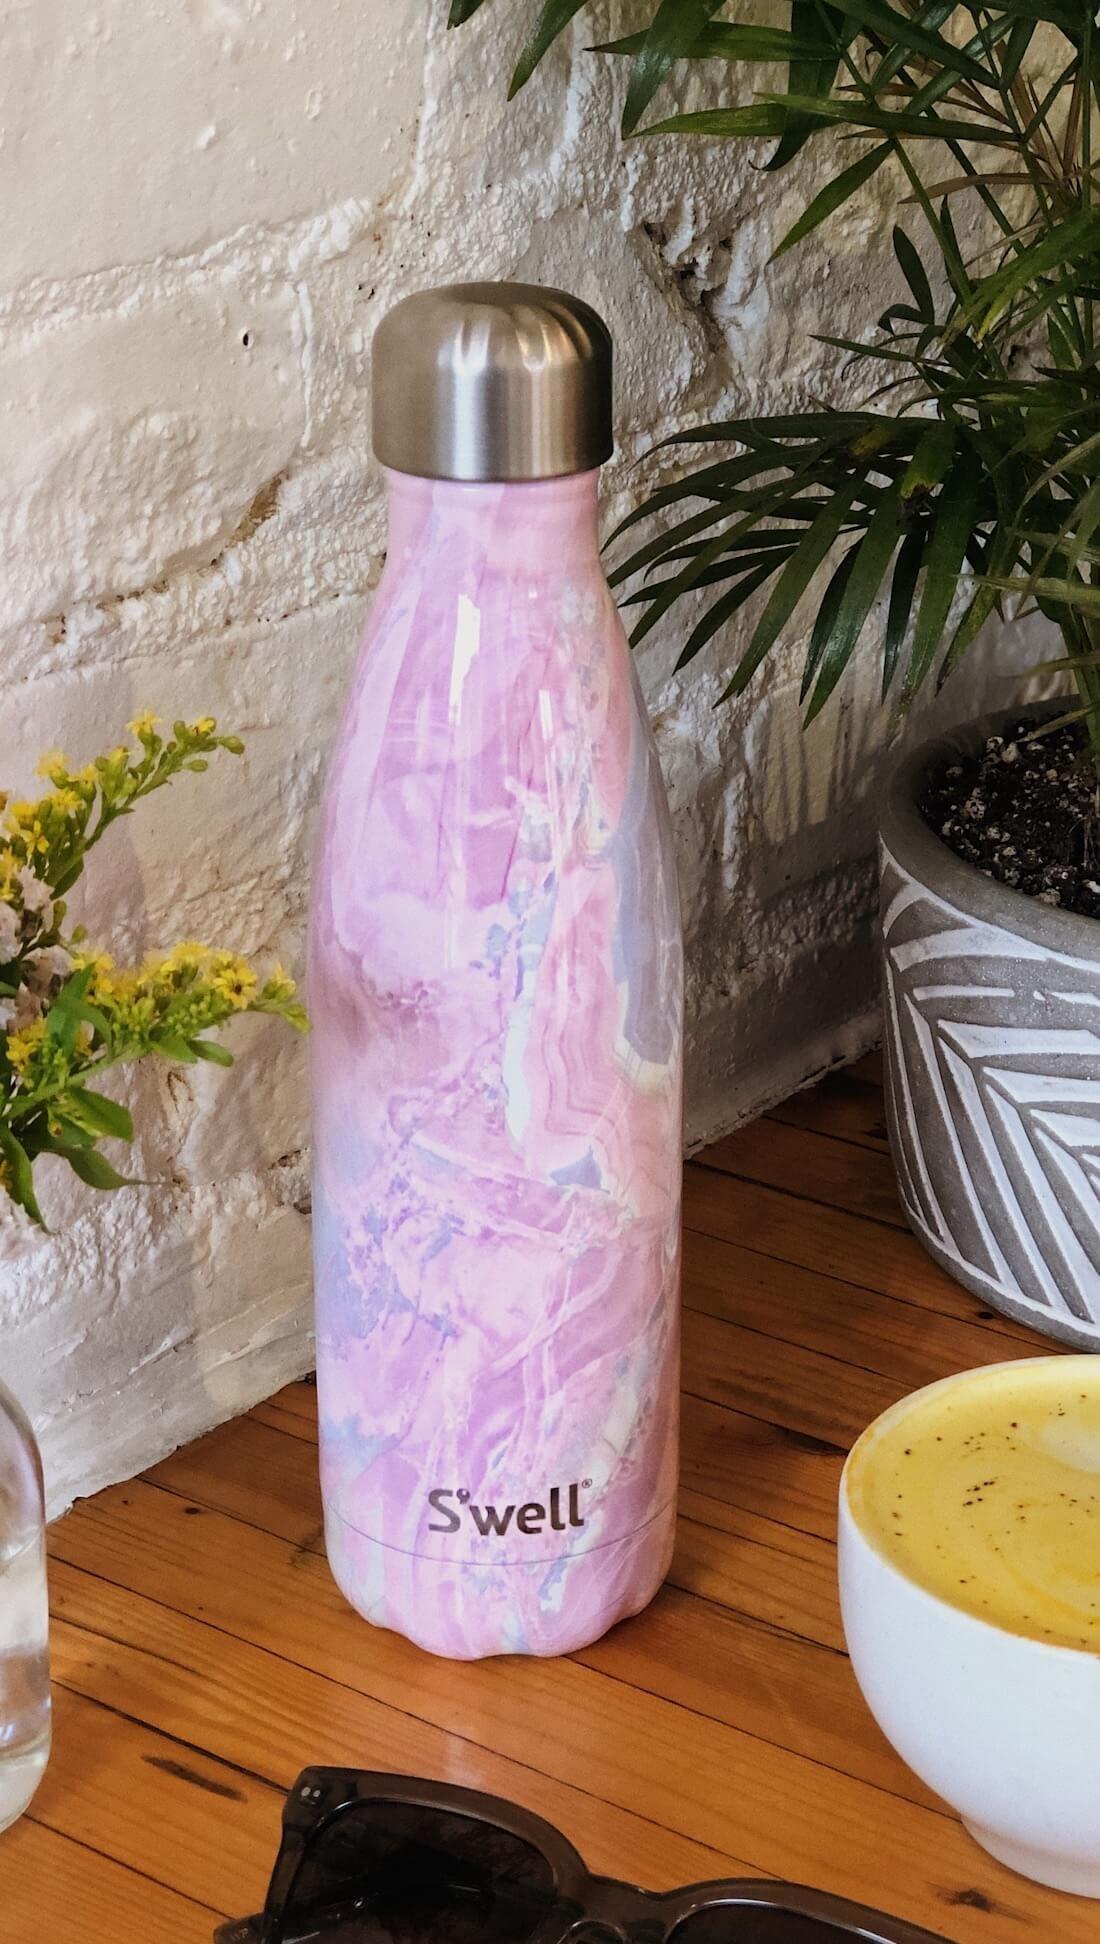 The S'well bottle inGeode Rose